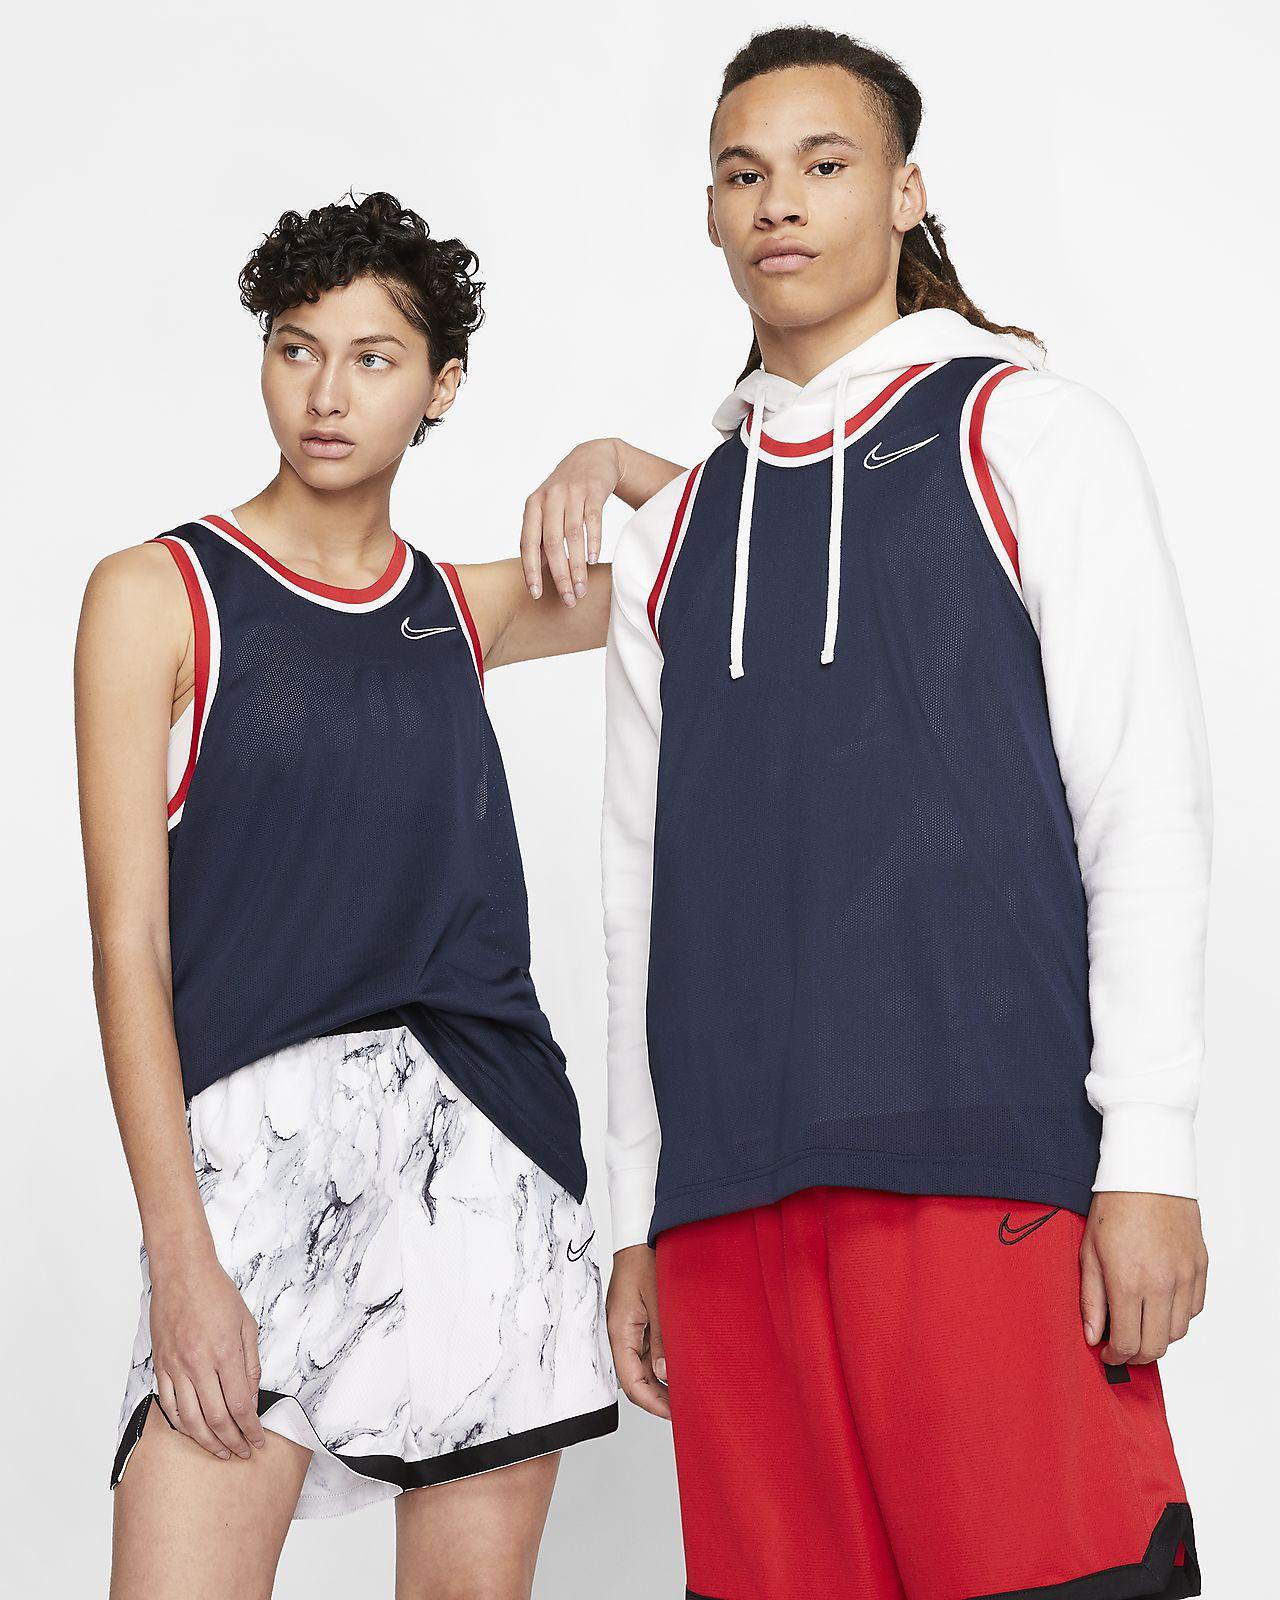 Basketbalový dres Nike Dri-FIT Classic